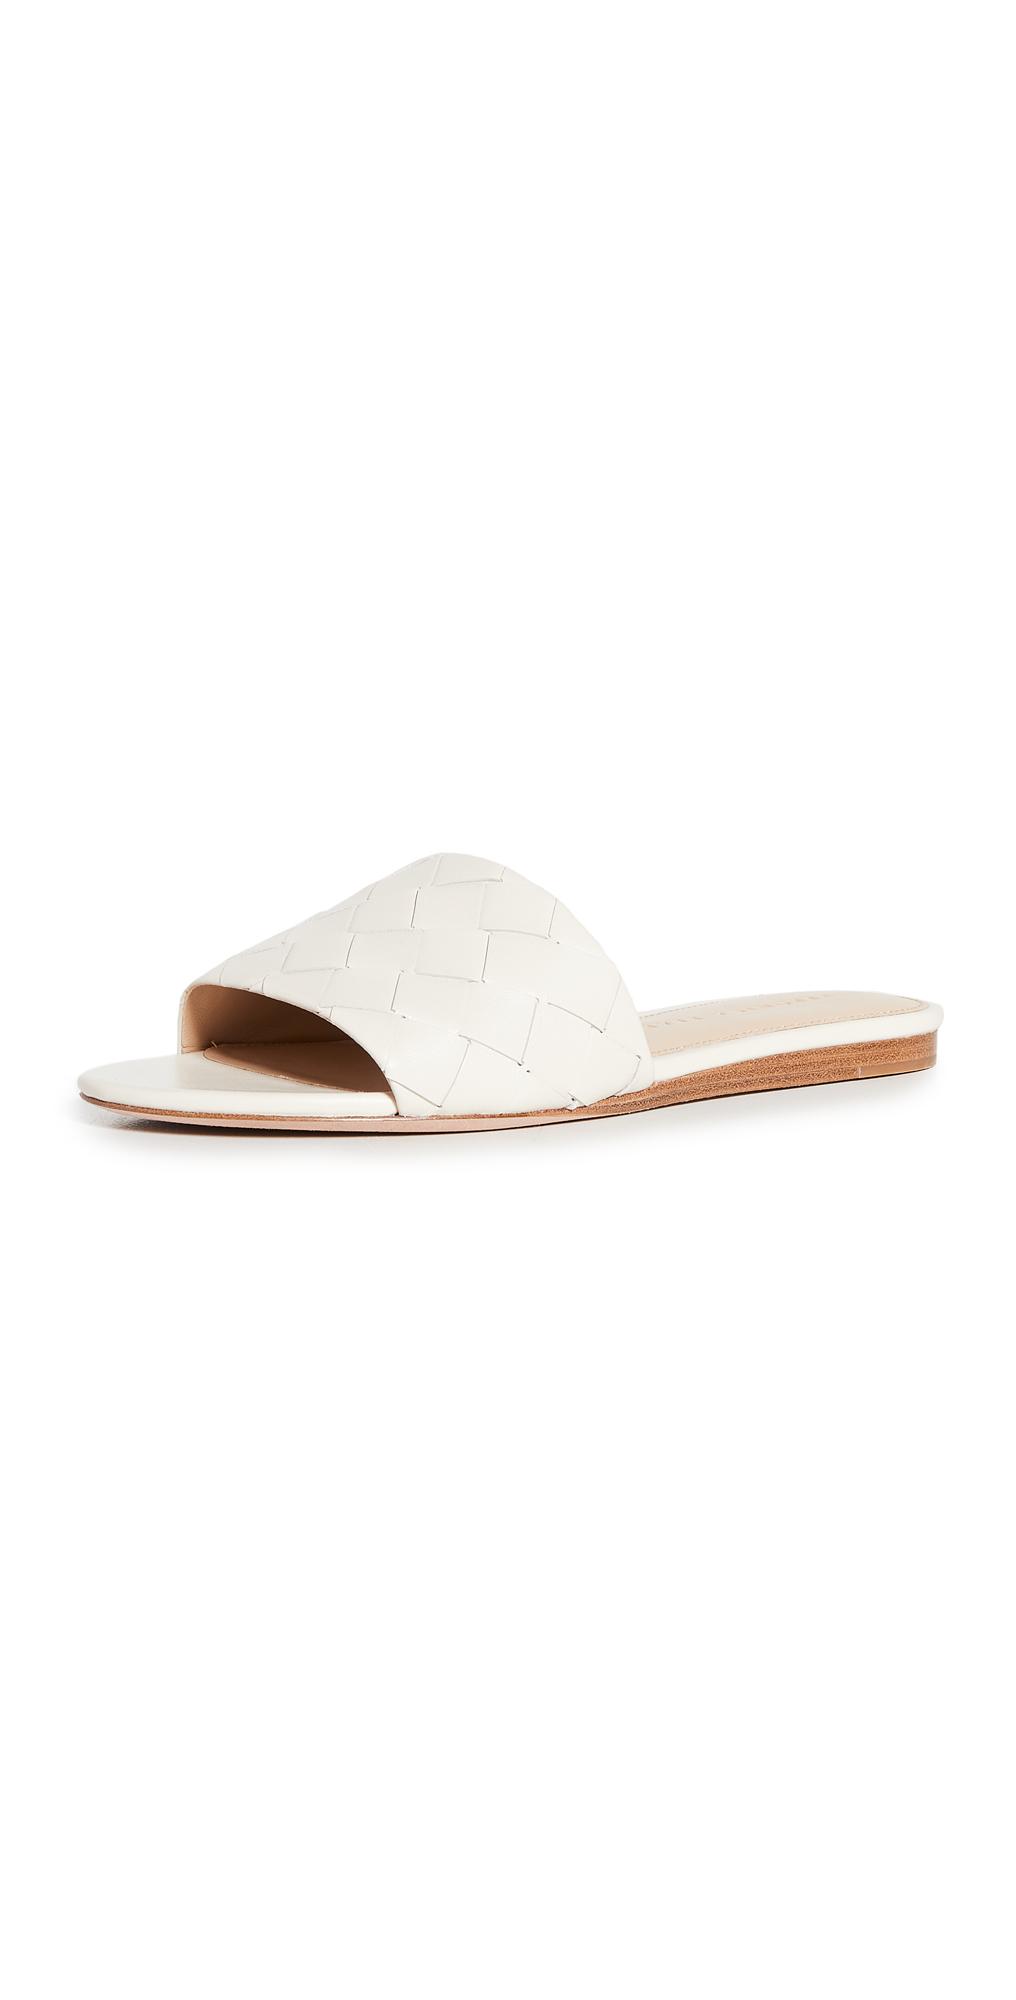 Veronica Beard Senta Sandals